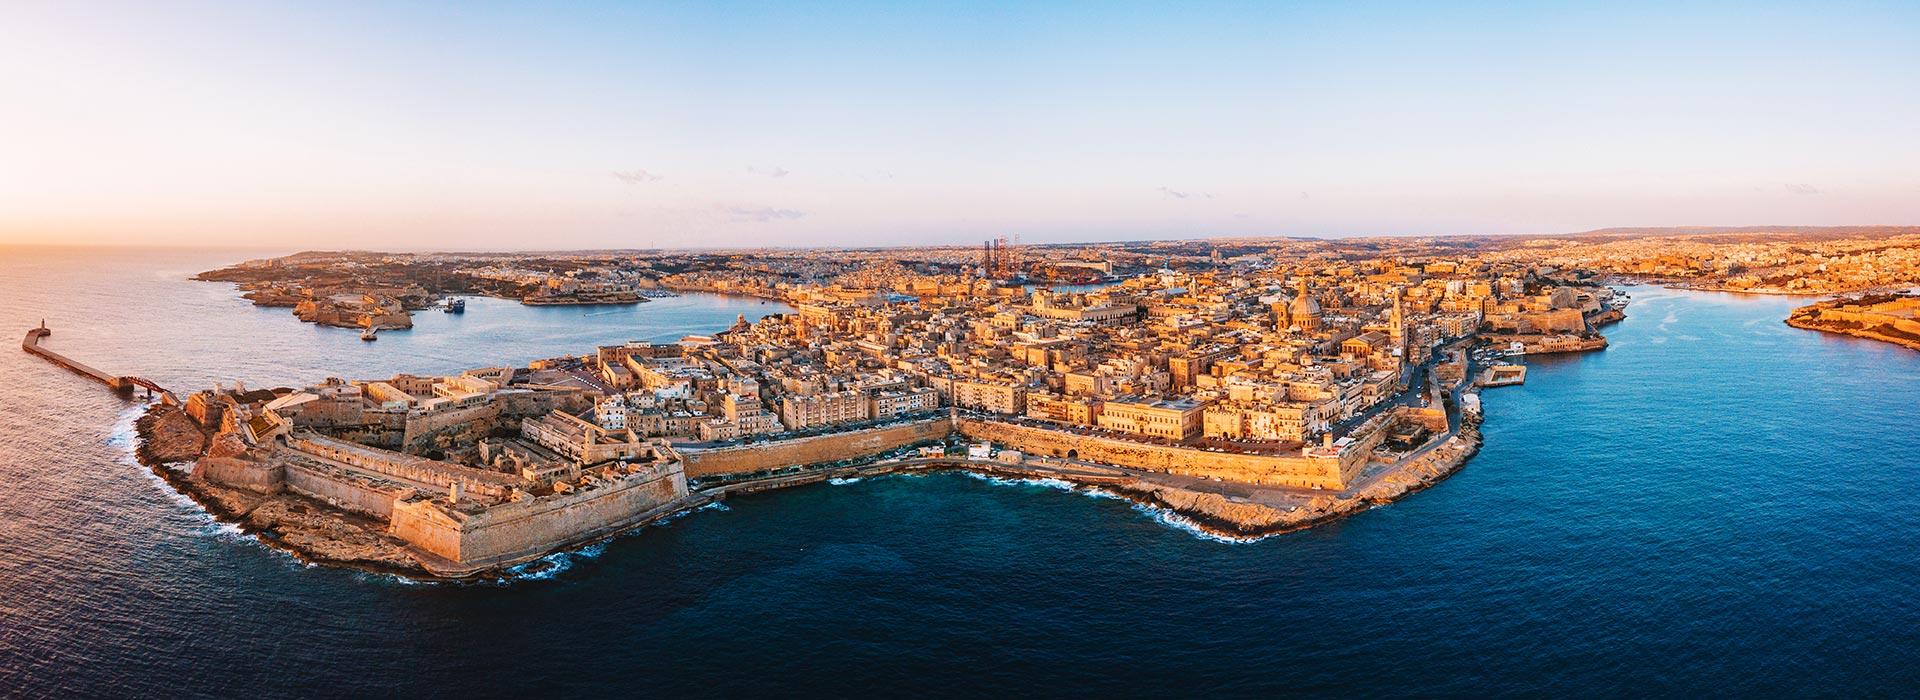 03_Malta_xw